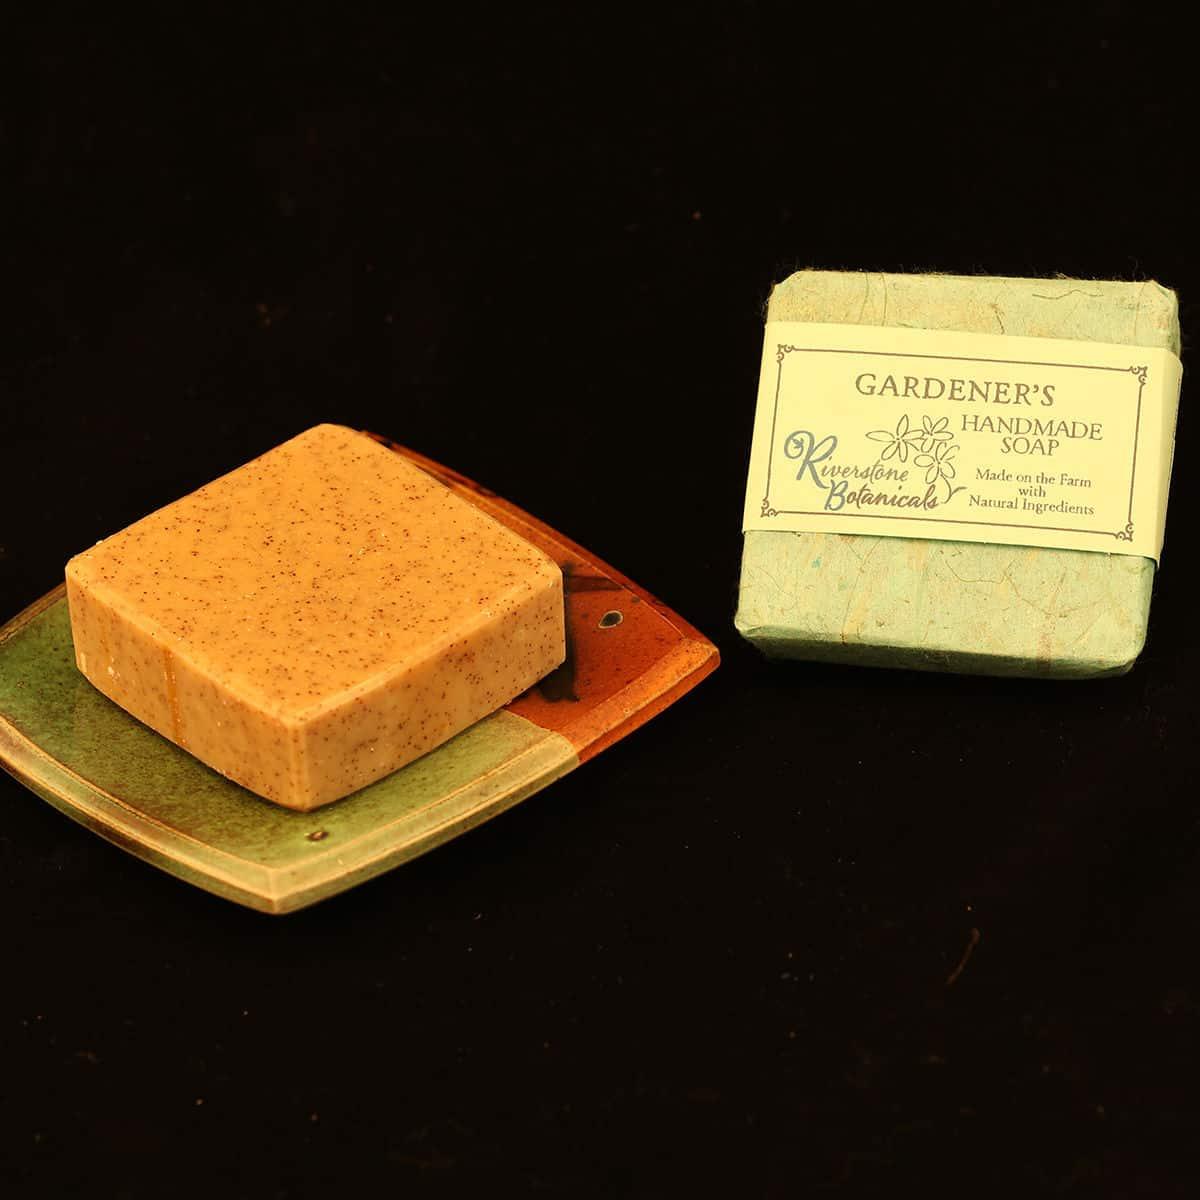 Riverstone Botanicals Gardener's Handmade Soap